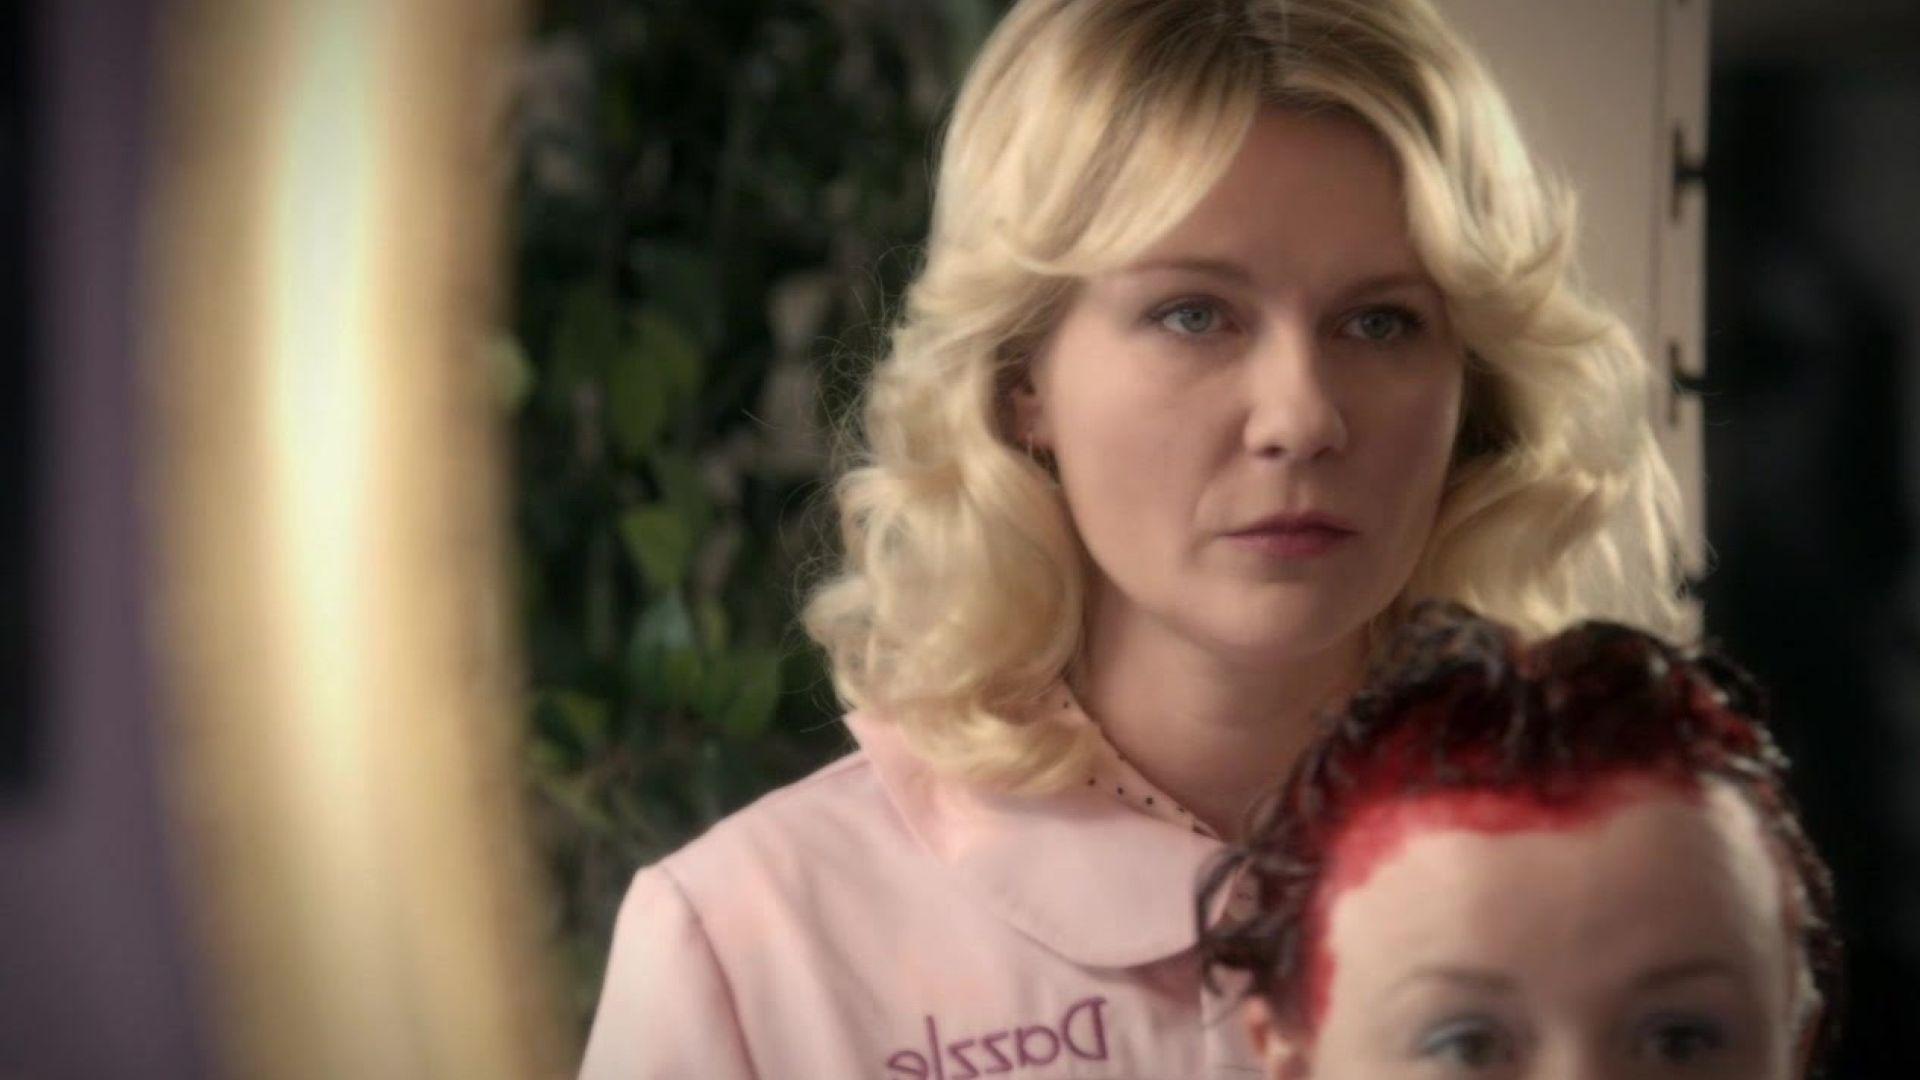 Kirsten Dunst featured in Fargo Season 2 'Curl Up N' Dye' te